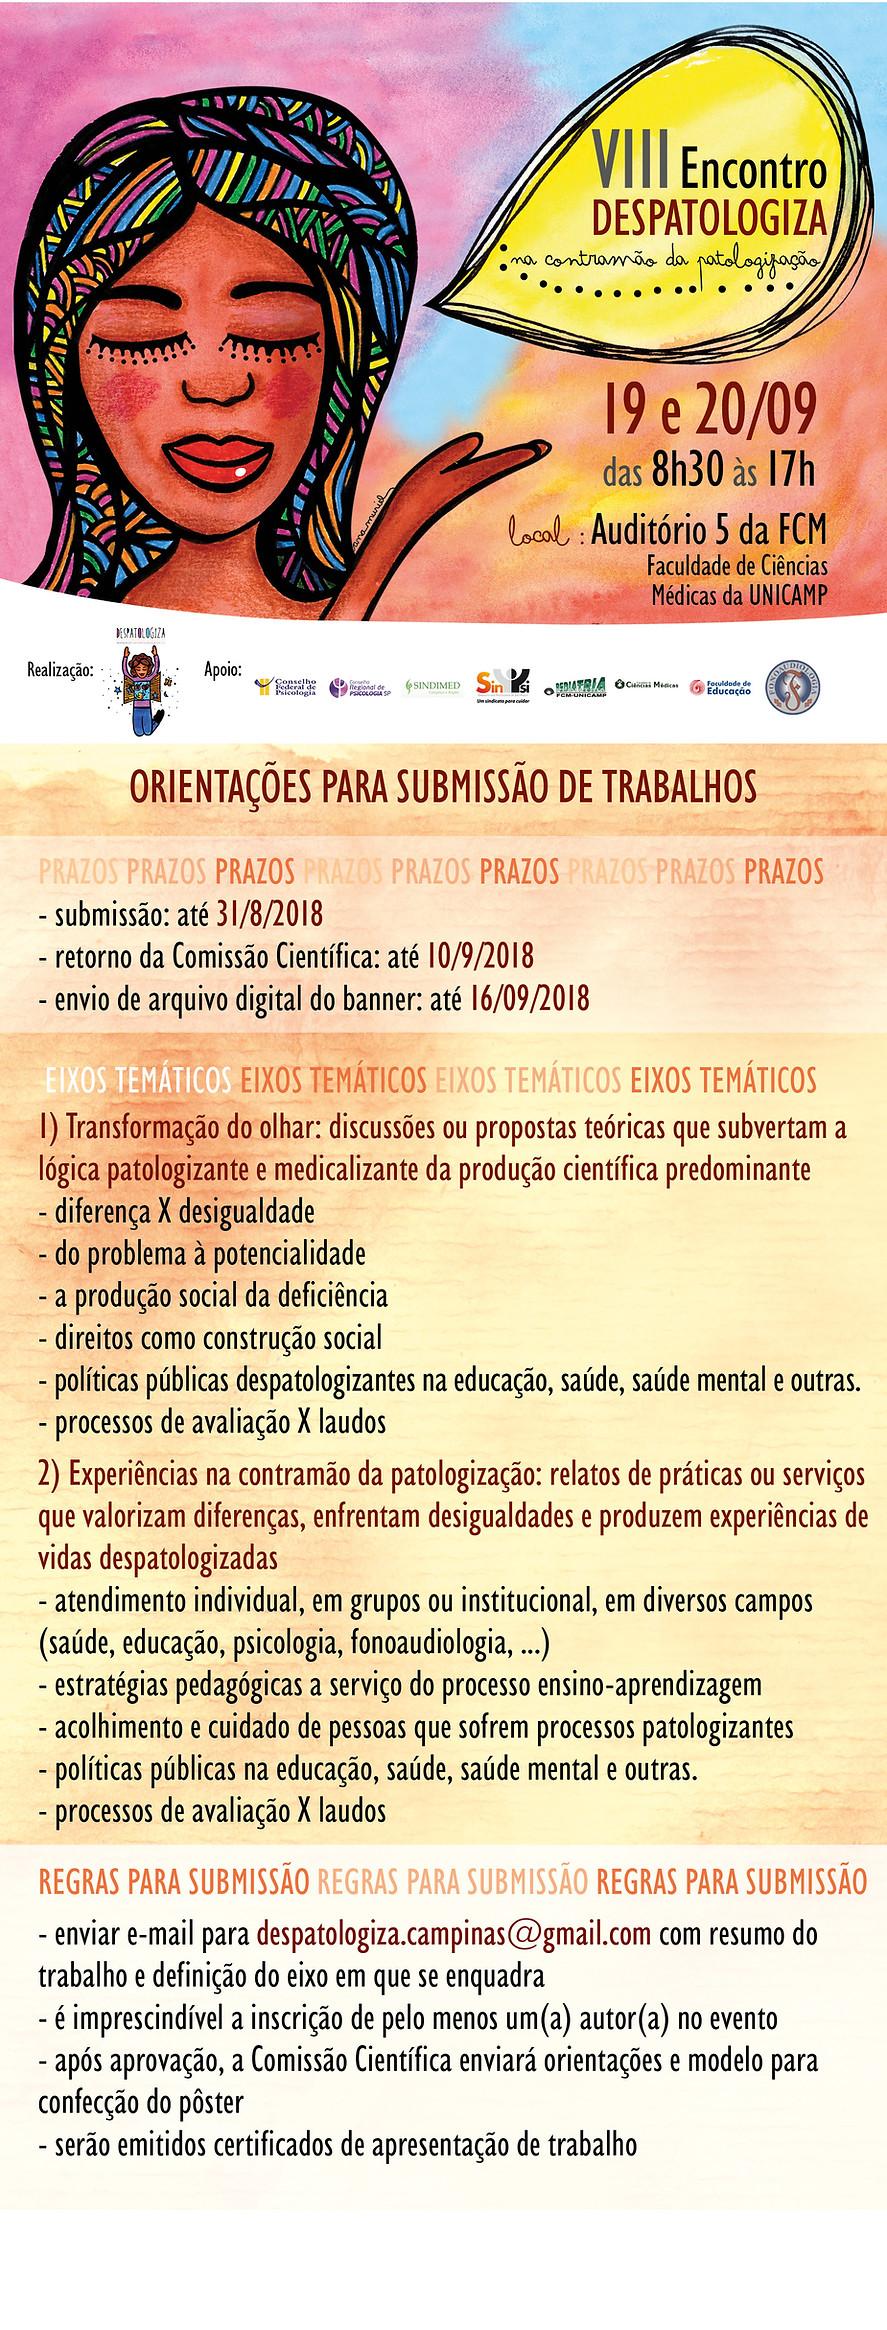 orientacoes_despatologiza.jpg